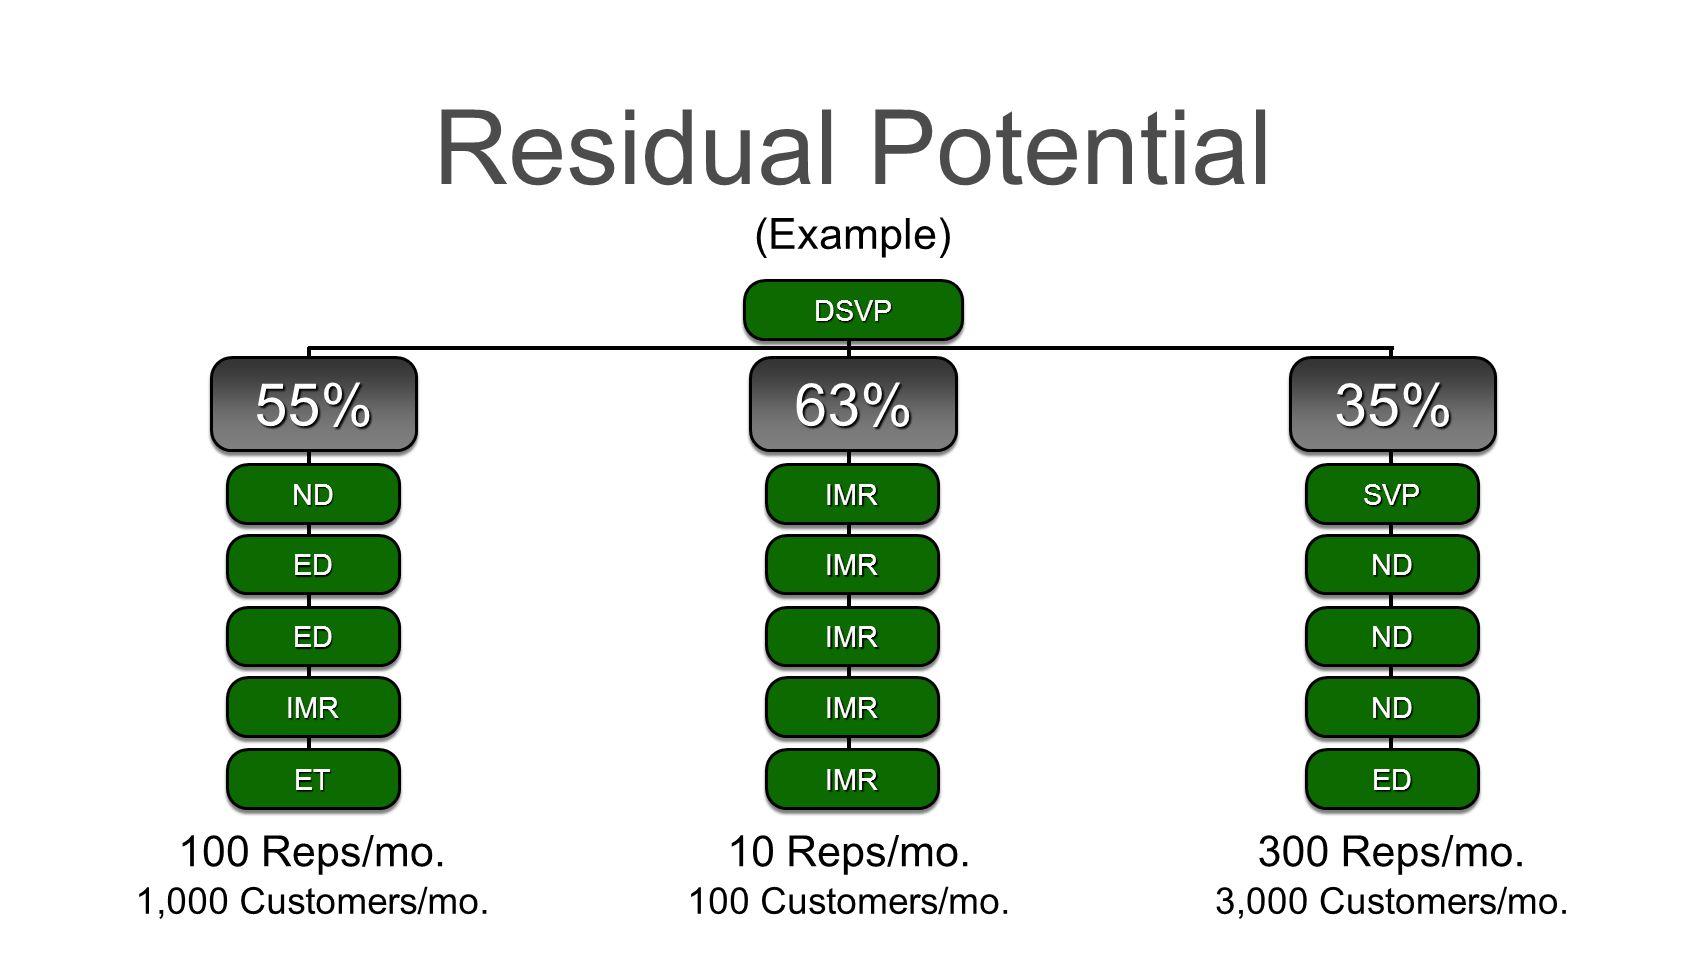 Residual Potential DSVPDSVP IMRIMR 63%63%55%55%35%35% IMRIMR IMRIMR IMRIMR IMRIMR NDND EDED EDED IMRIMR ETET SVPSVP NDND NDND NDND EDED (Example) 100